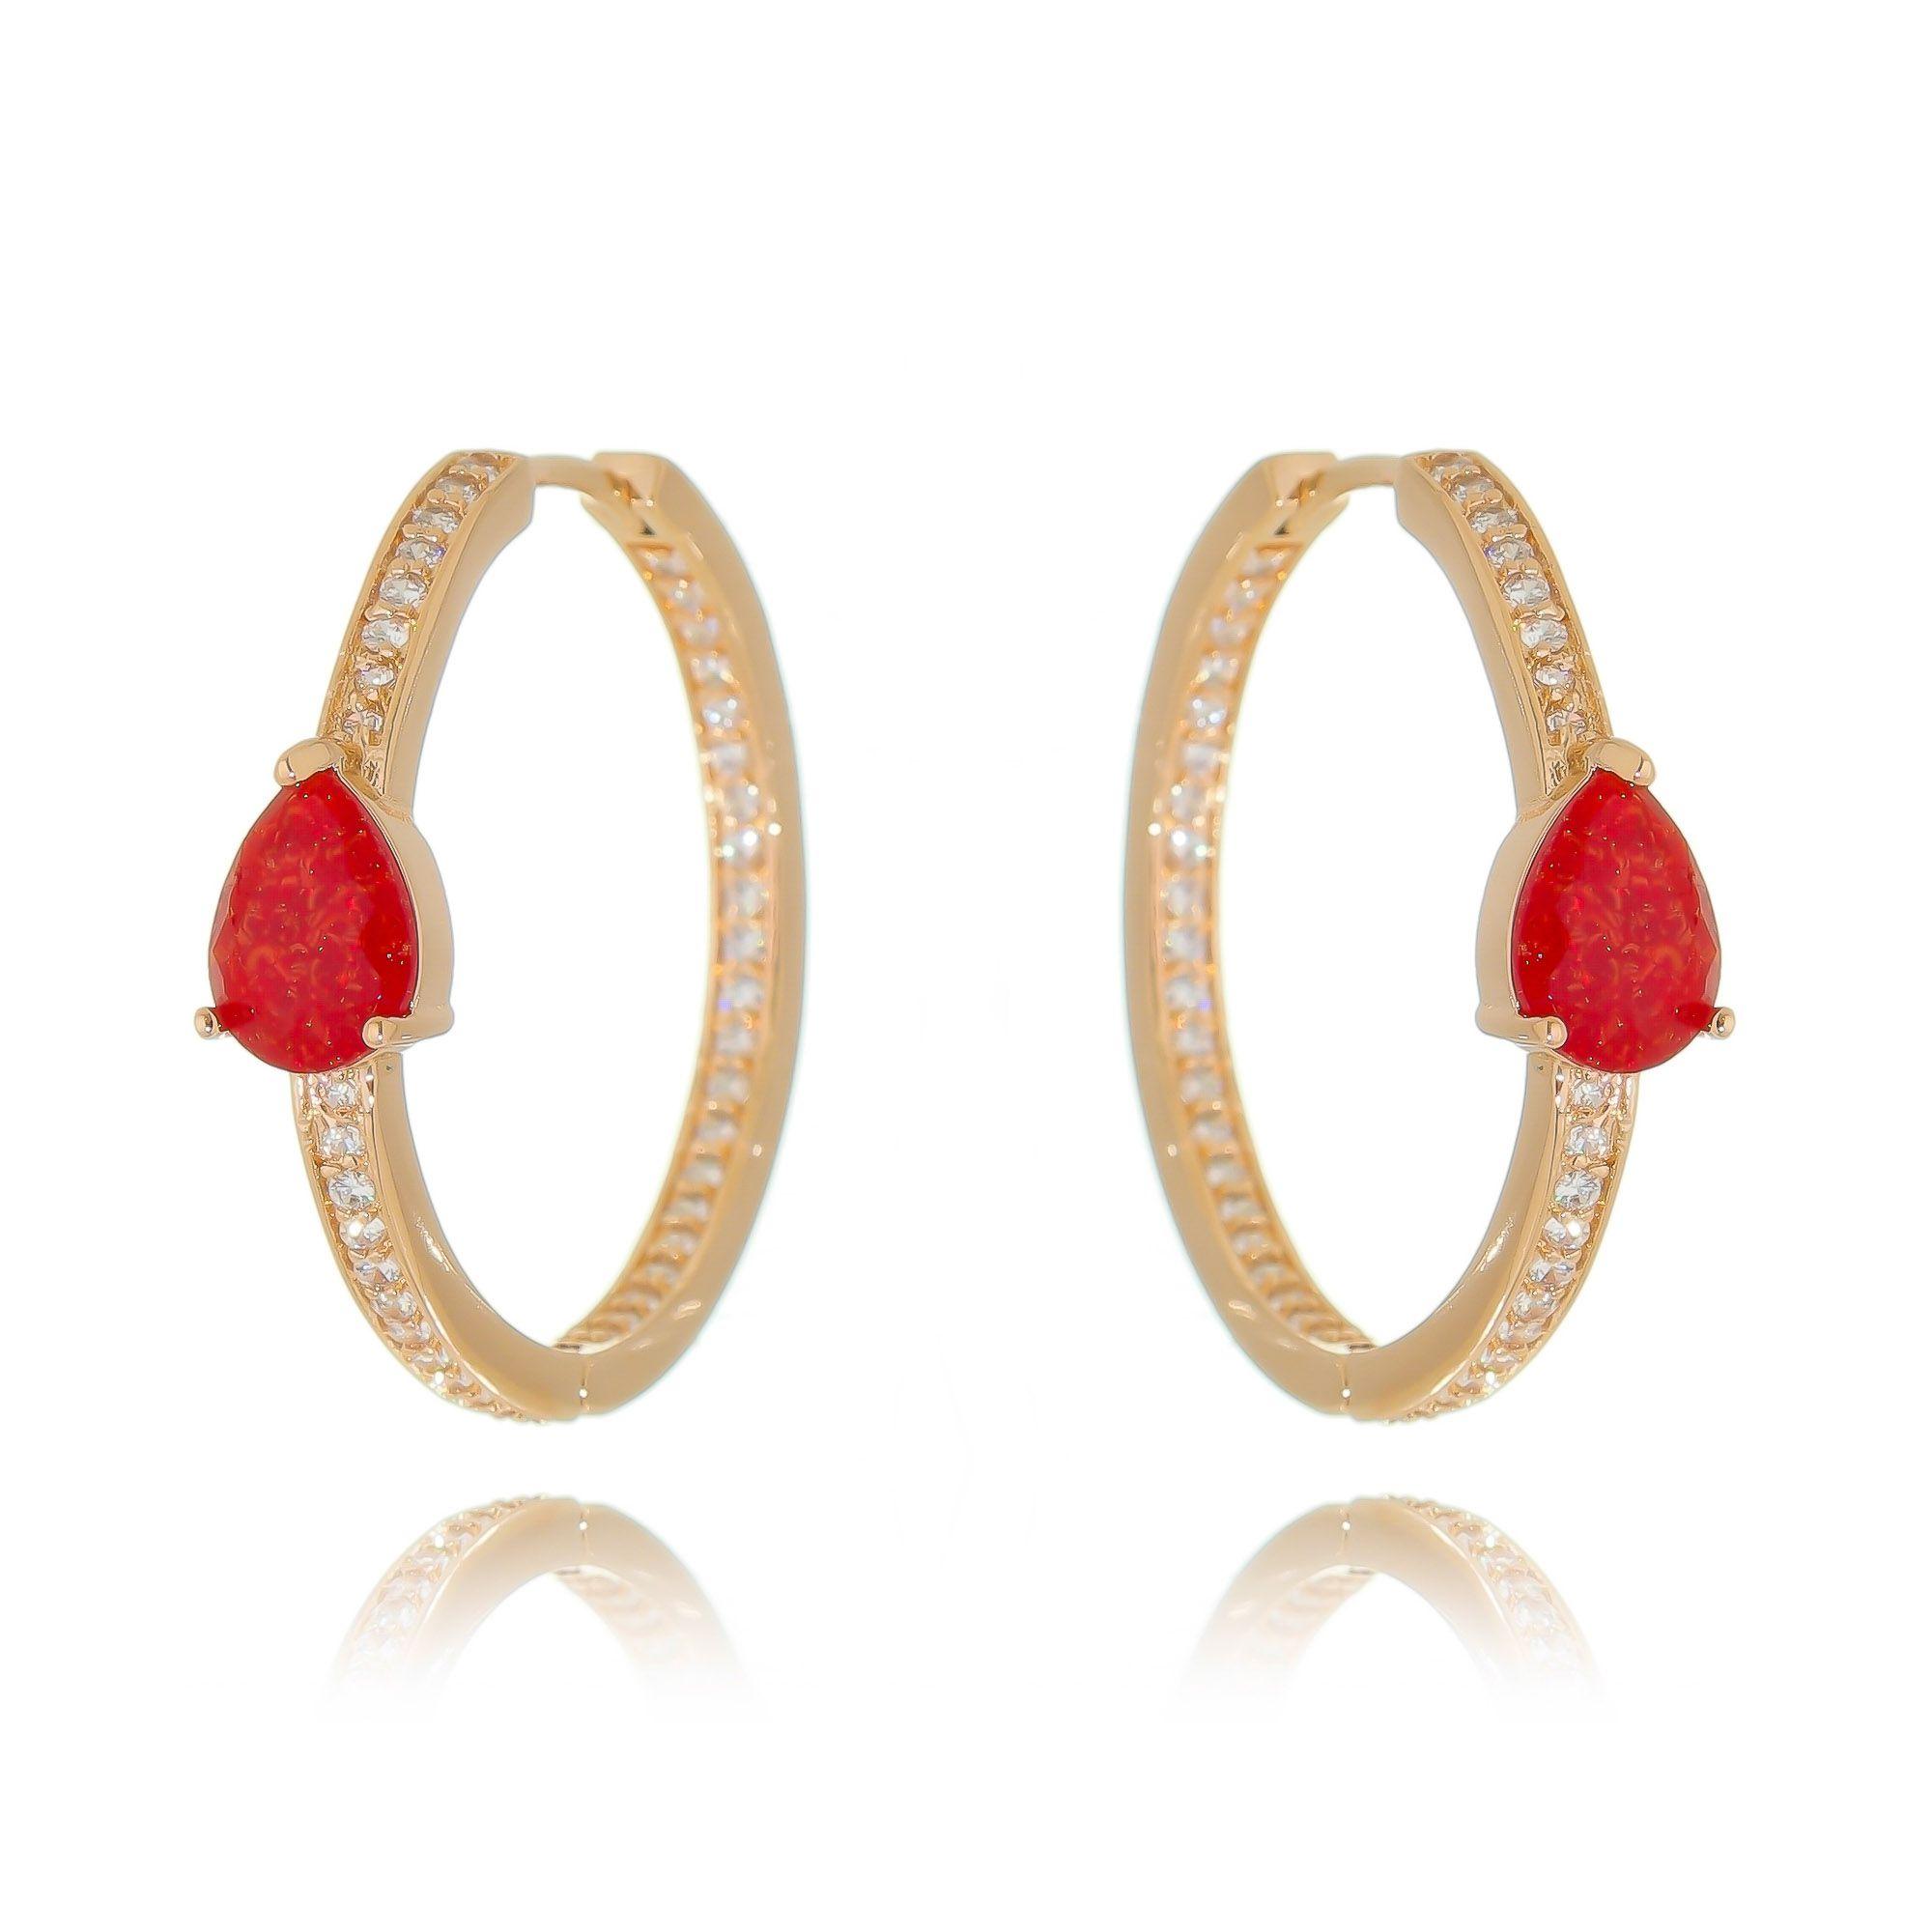 Argola Pedra Fusion Rubi e Zircônia Branca Semijoia Ouro Rosé  - Soloyou